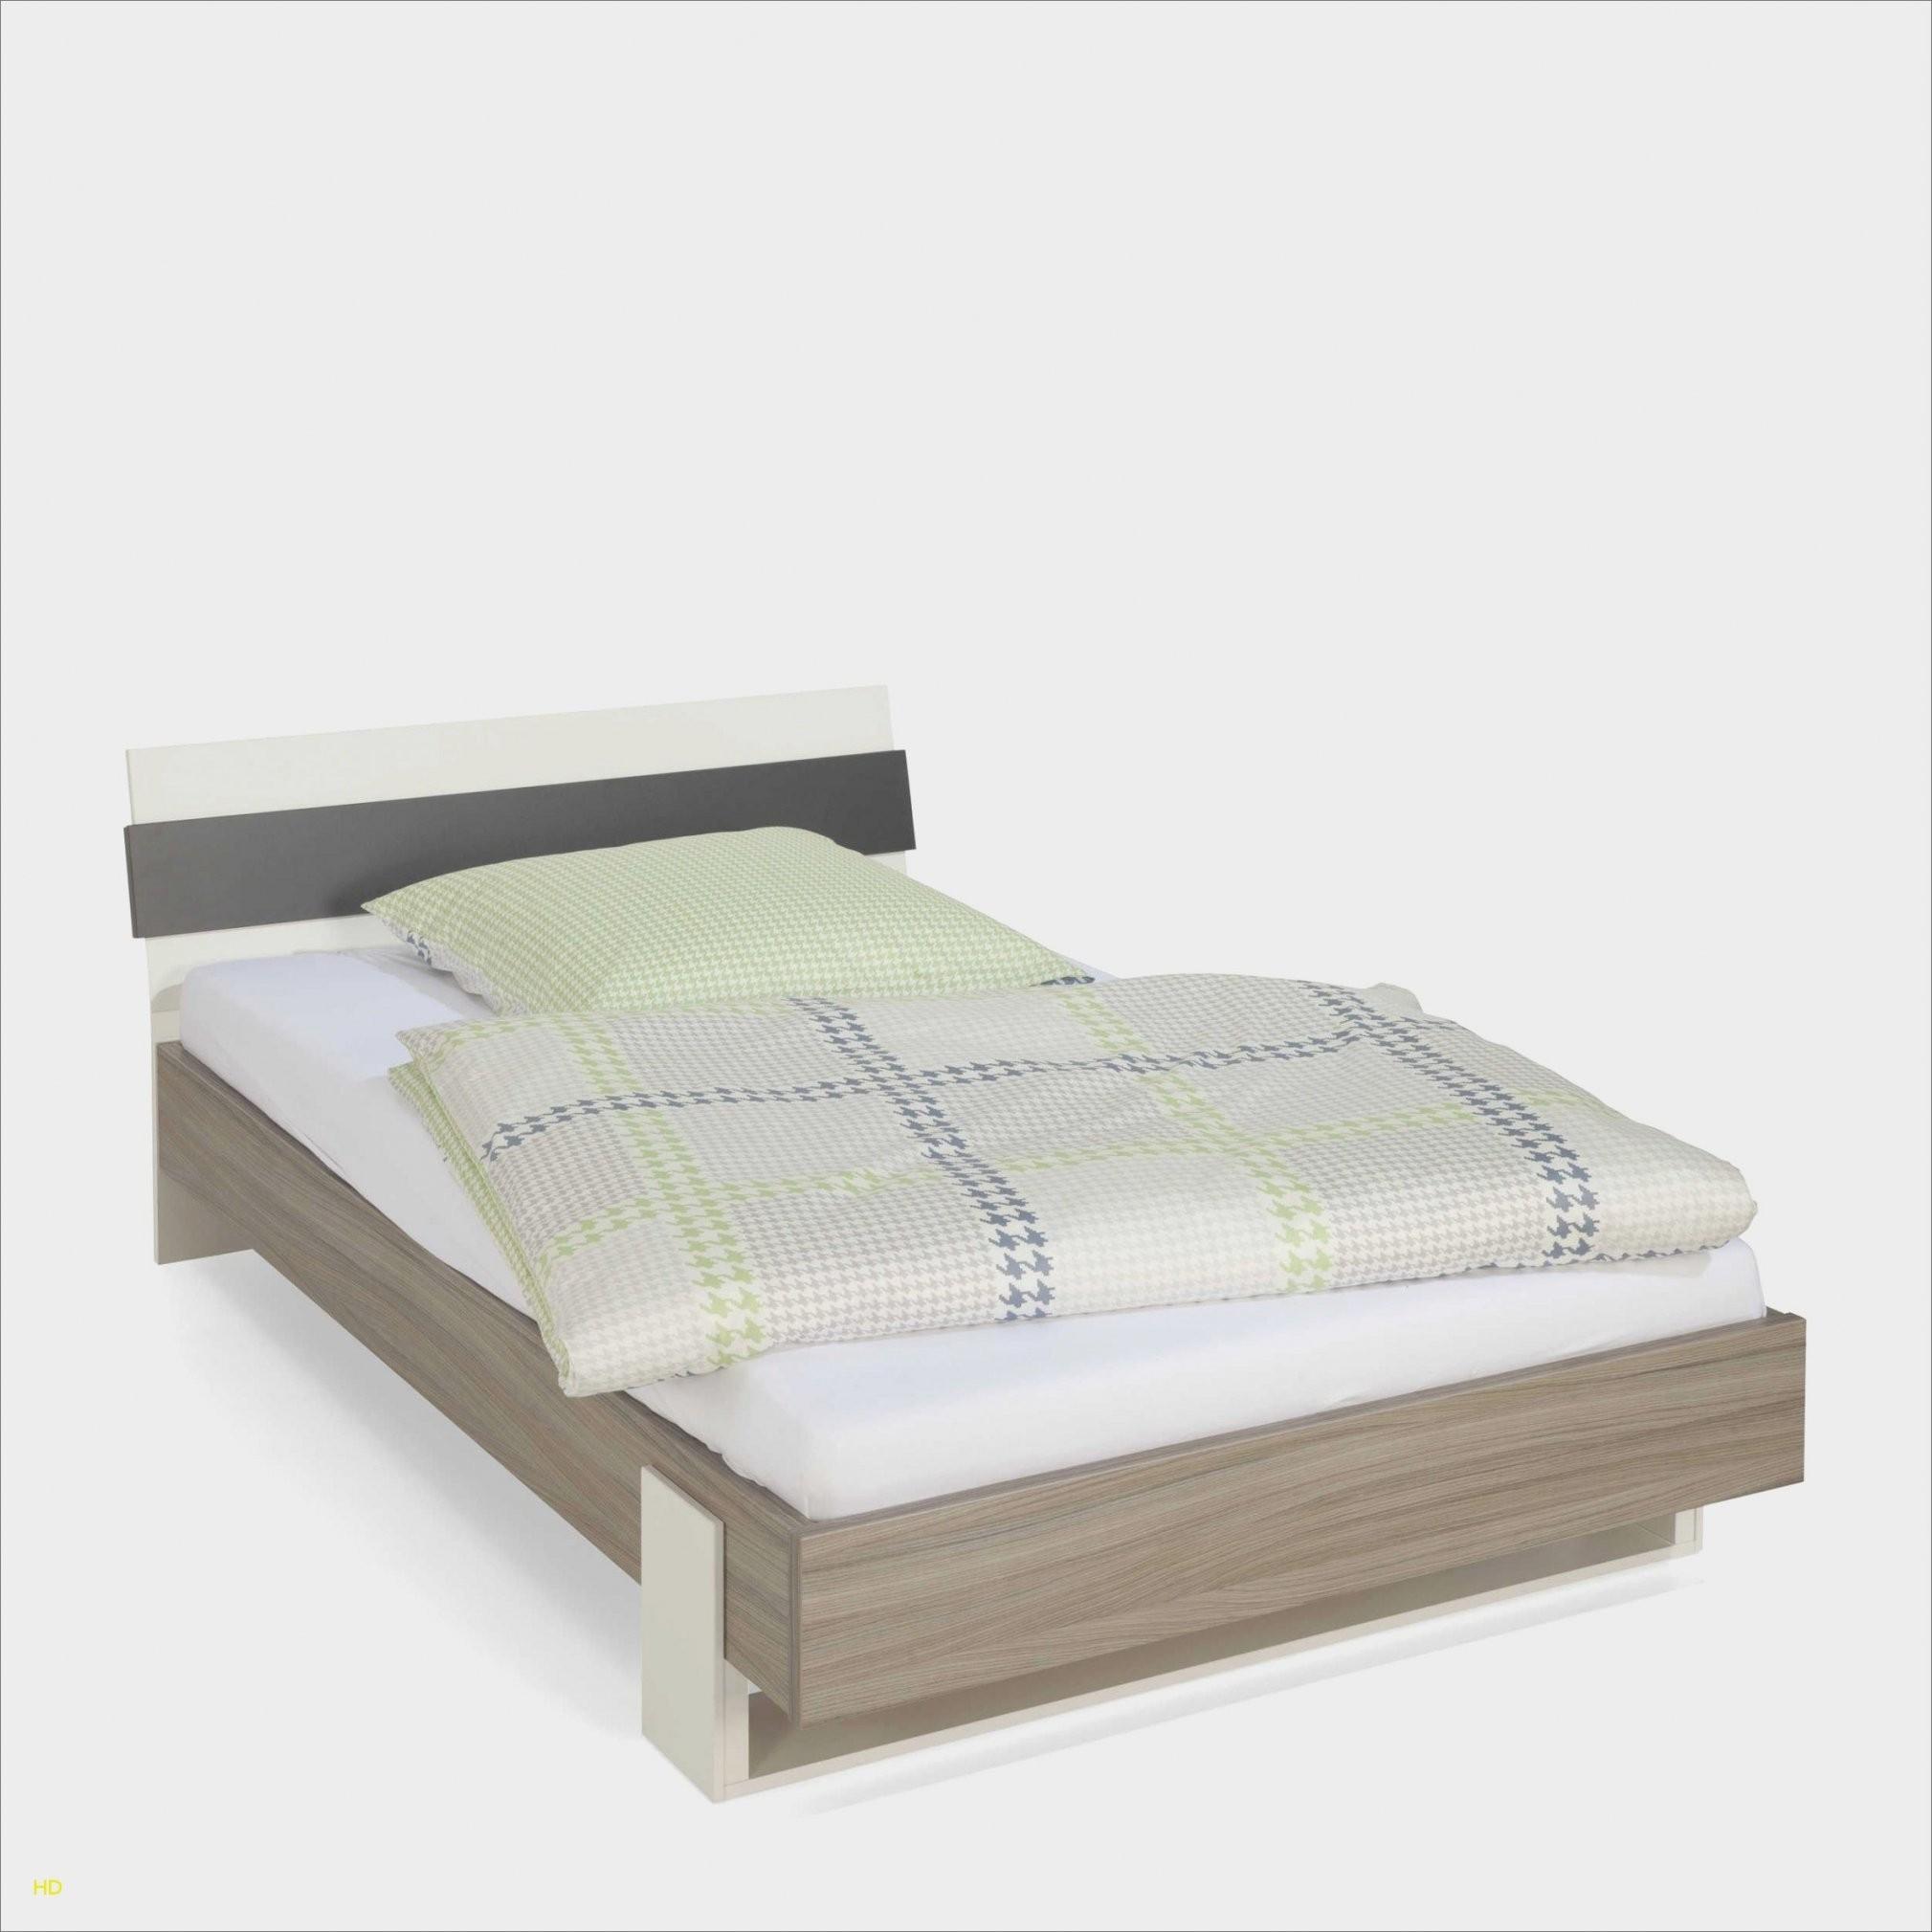 Himmelbett 120X200 Genial 18 Elegant Led Bett 120X200  Sanpas Home von Led Bett 120X200 Bild